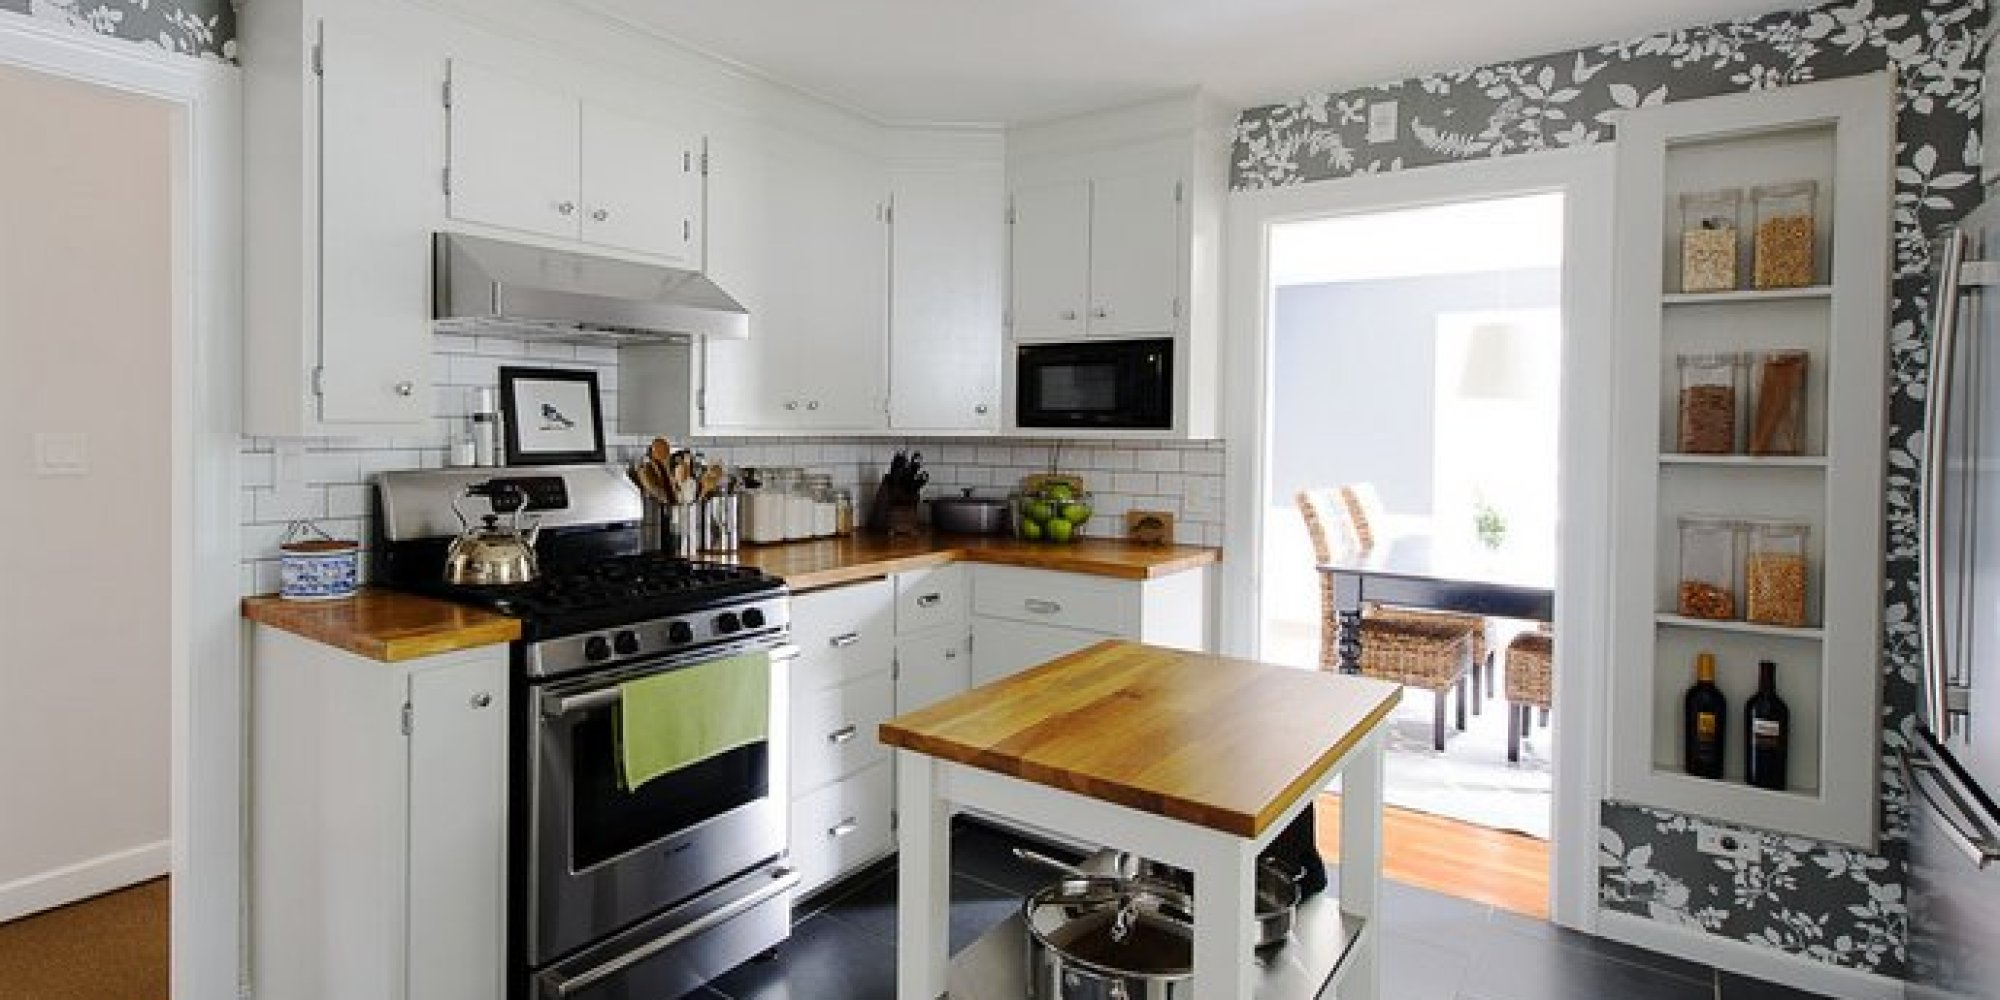 small kitchen updates photo - 2